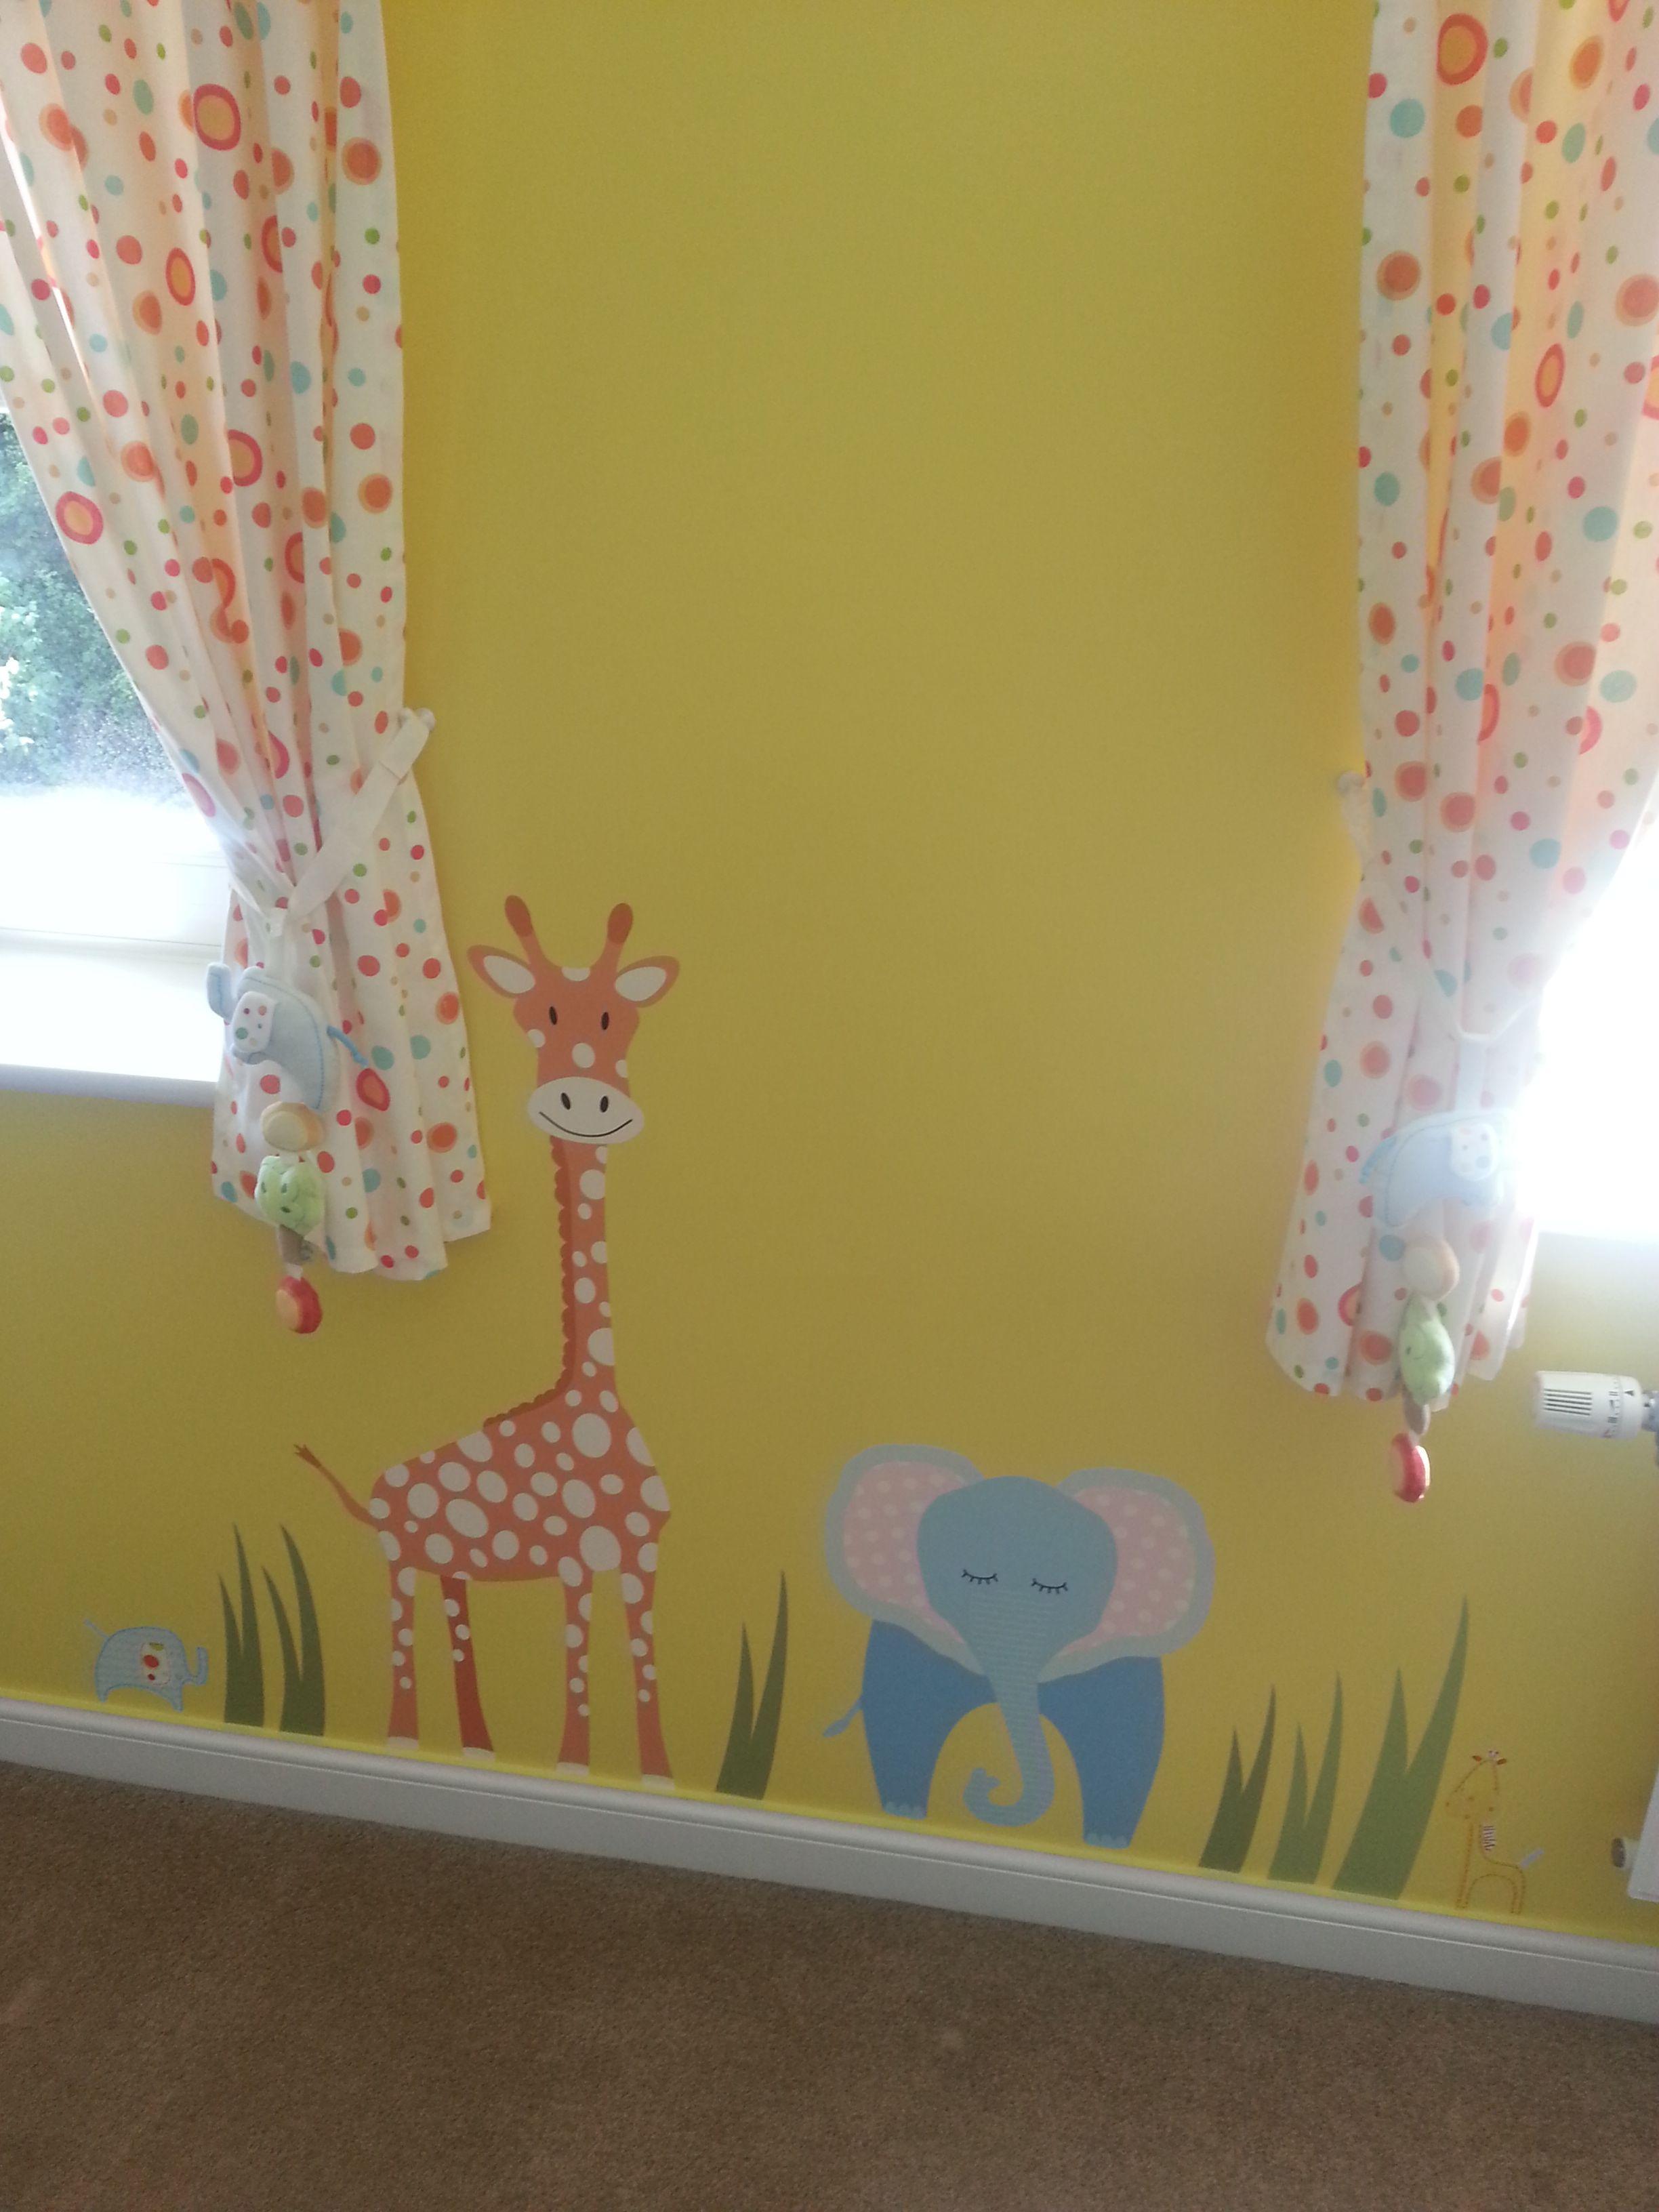 Jungle Animal Nursery Wall Art Scene www.enchanted-interiors.co.uk ...